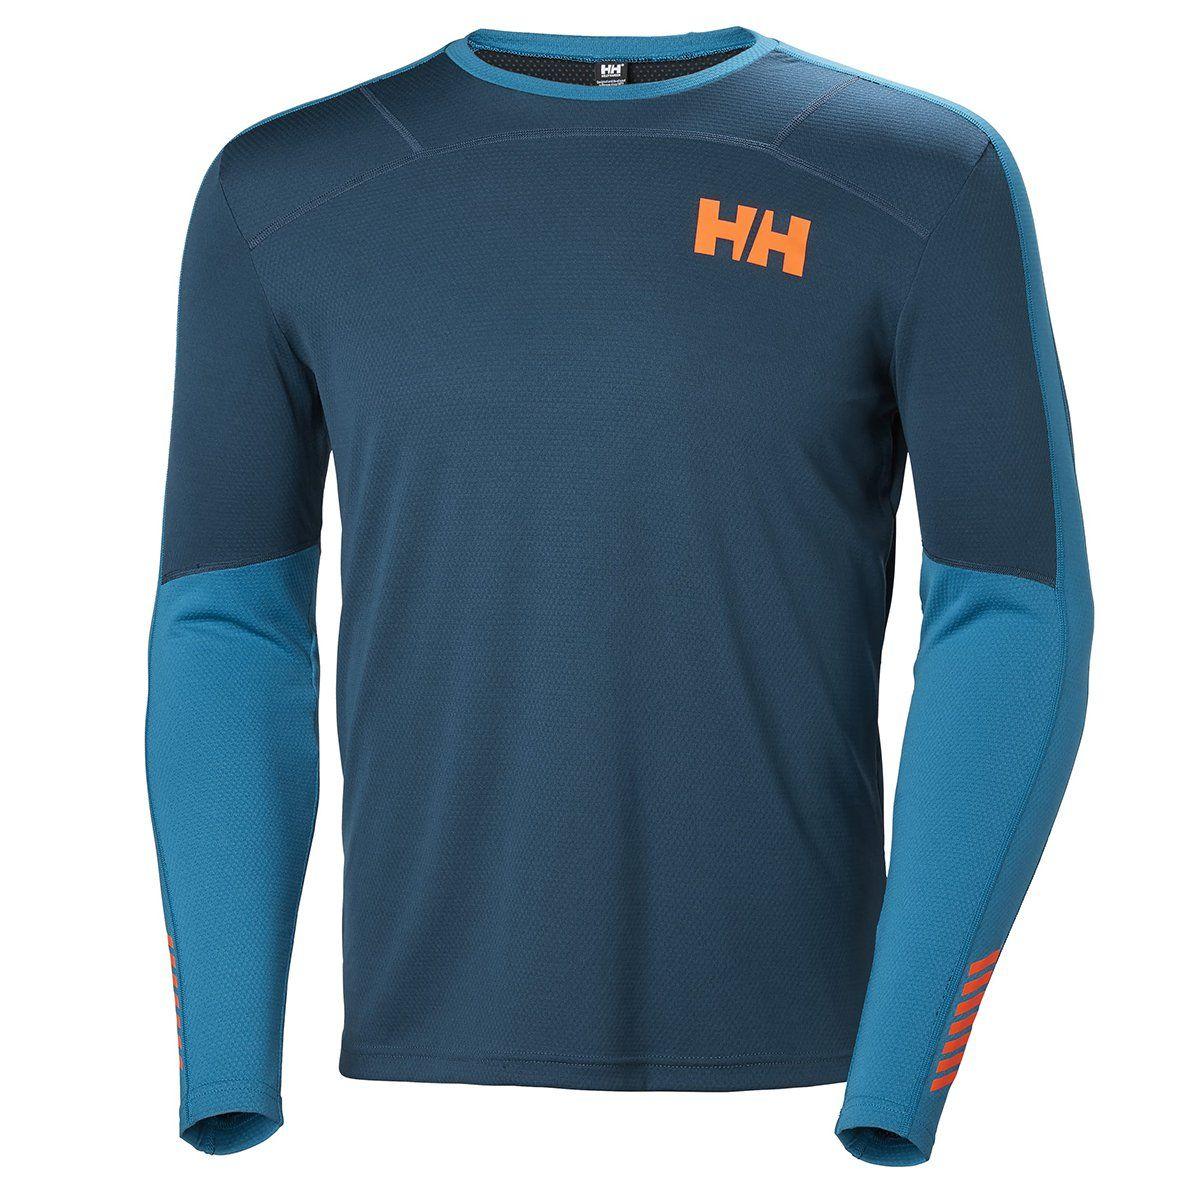 Helly Hansen Mens Hh LIFA Active Mesh Shortsleeve Baselayer Wicking Top